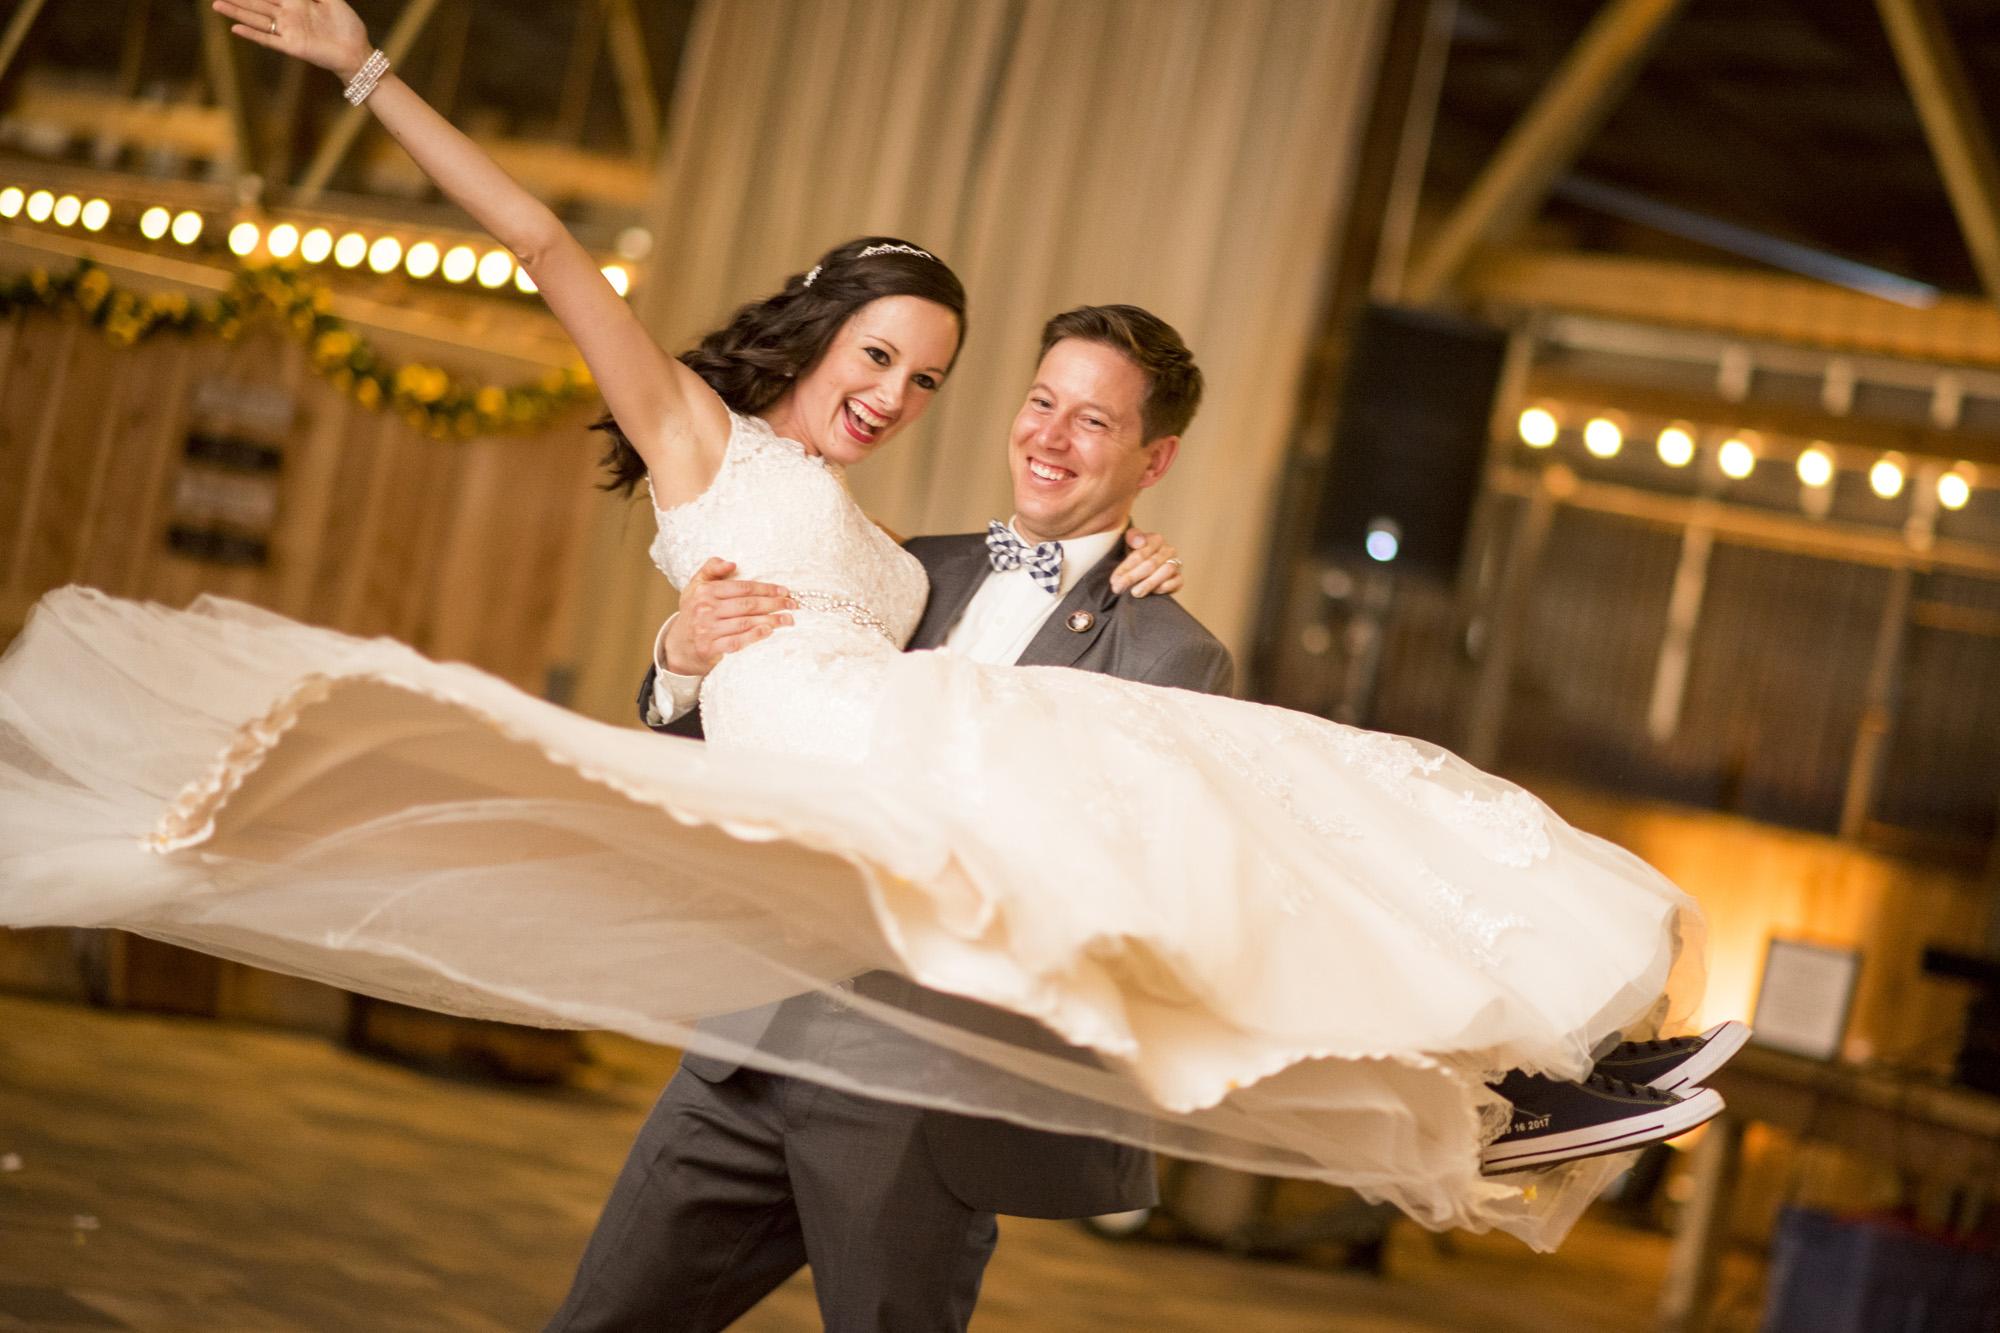 Seriously_Sabrina_Photography_Bowling_Green_Kentucky_Highland_Stables_Wedding_Wolff129.jpg